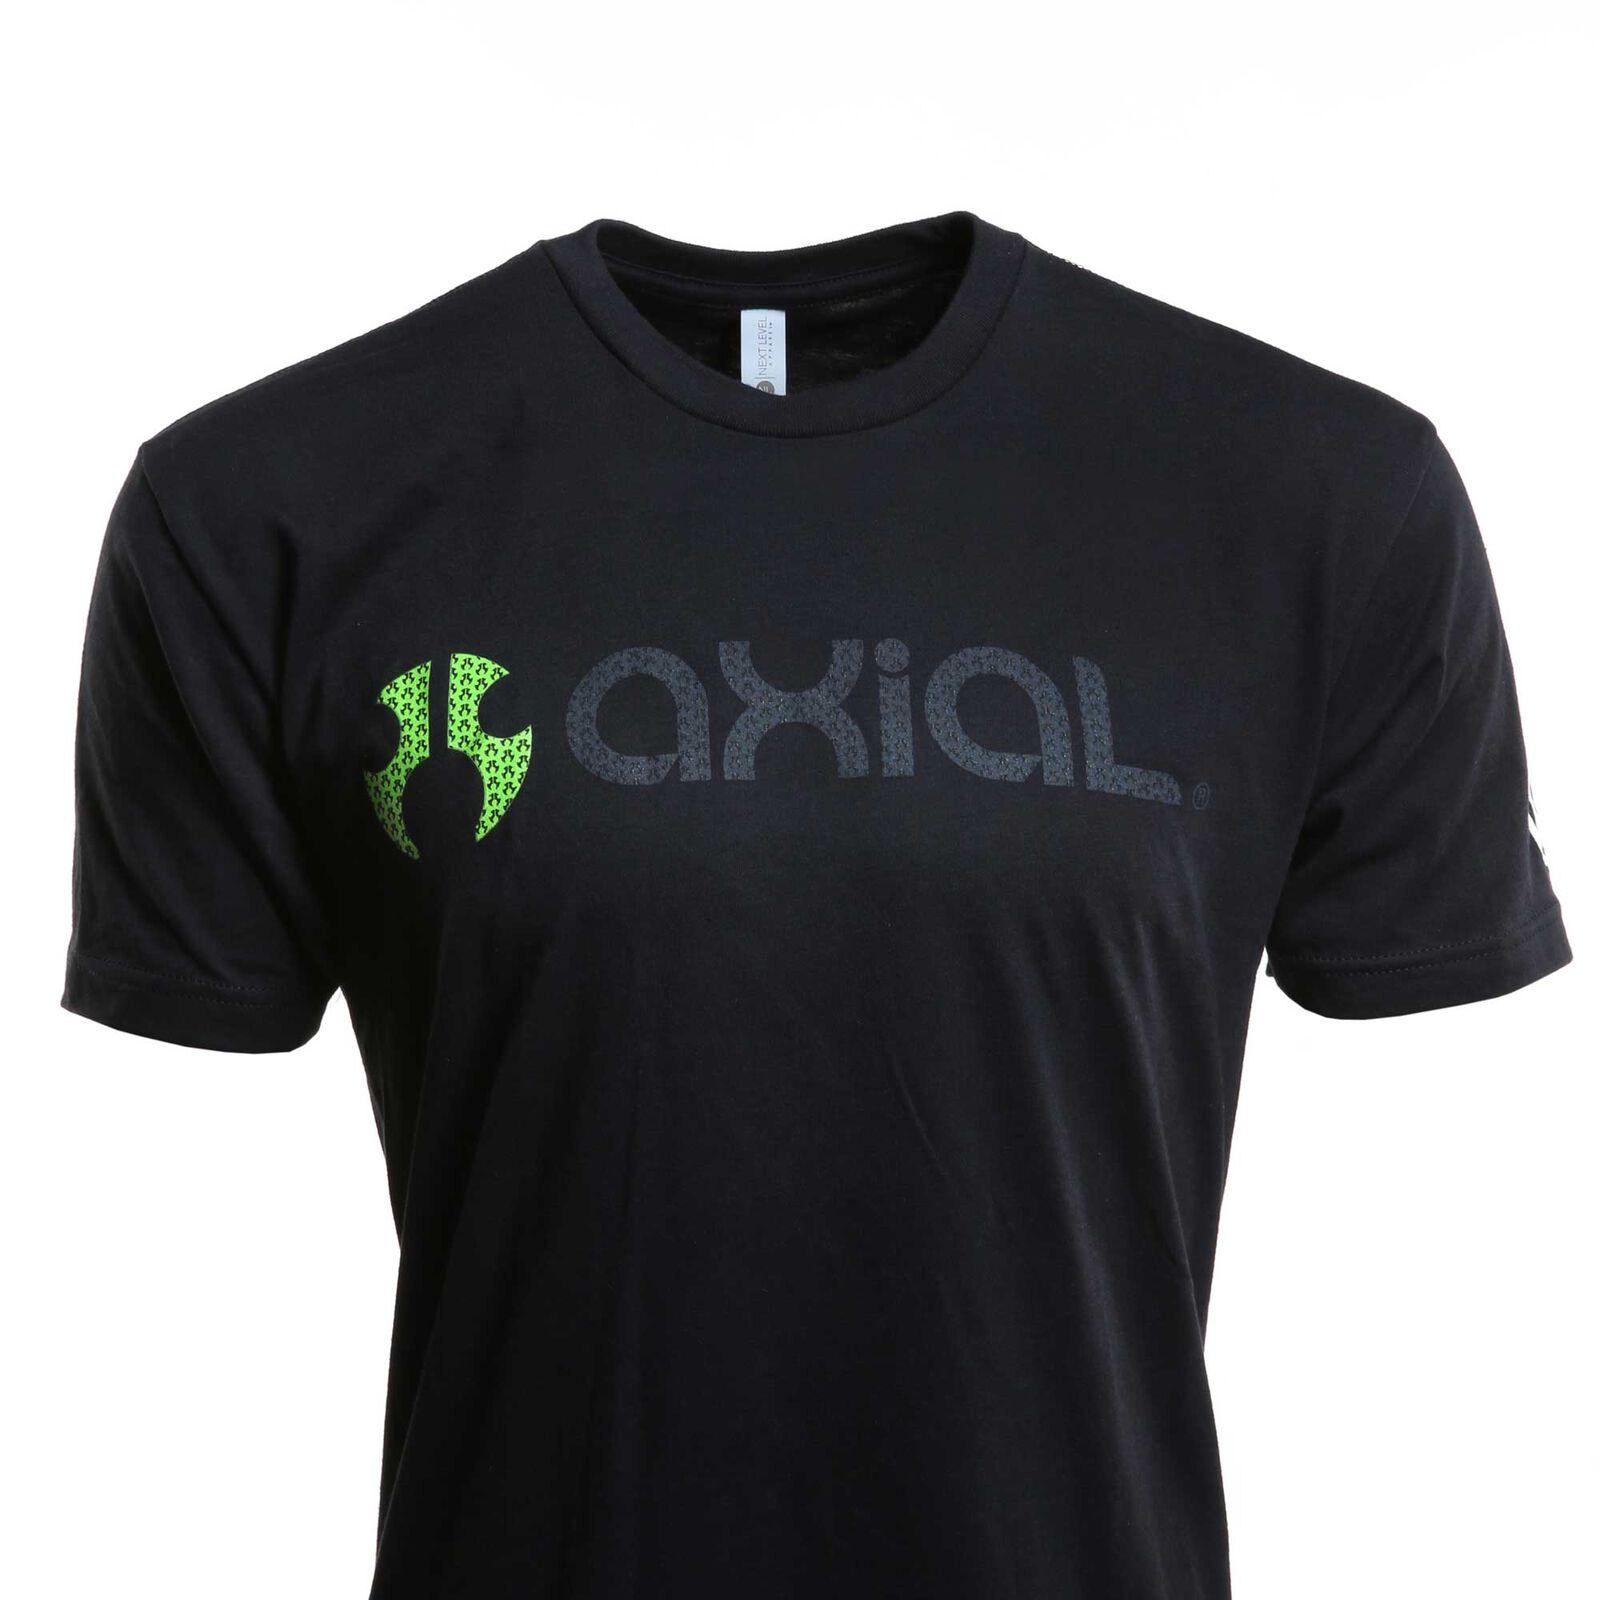 Logo Shirt, Small